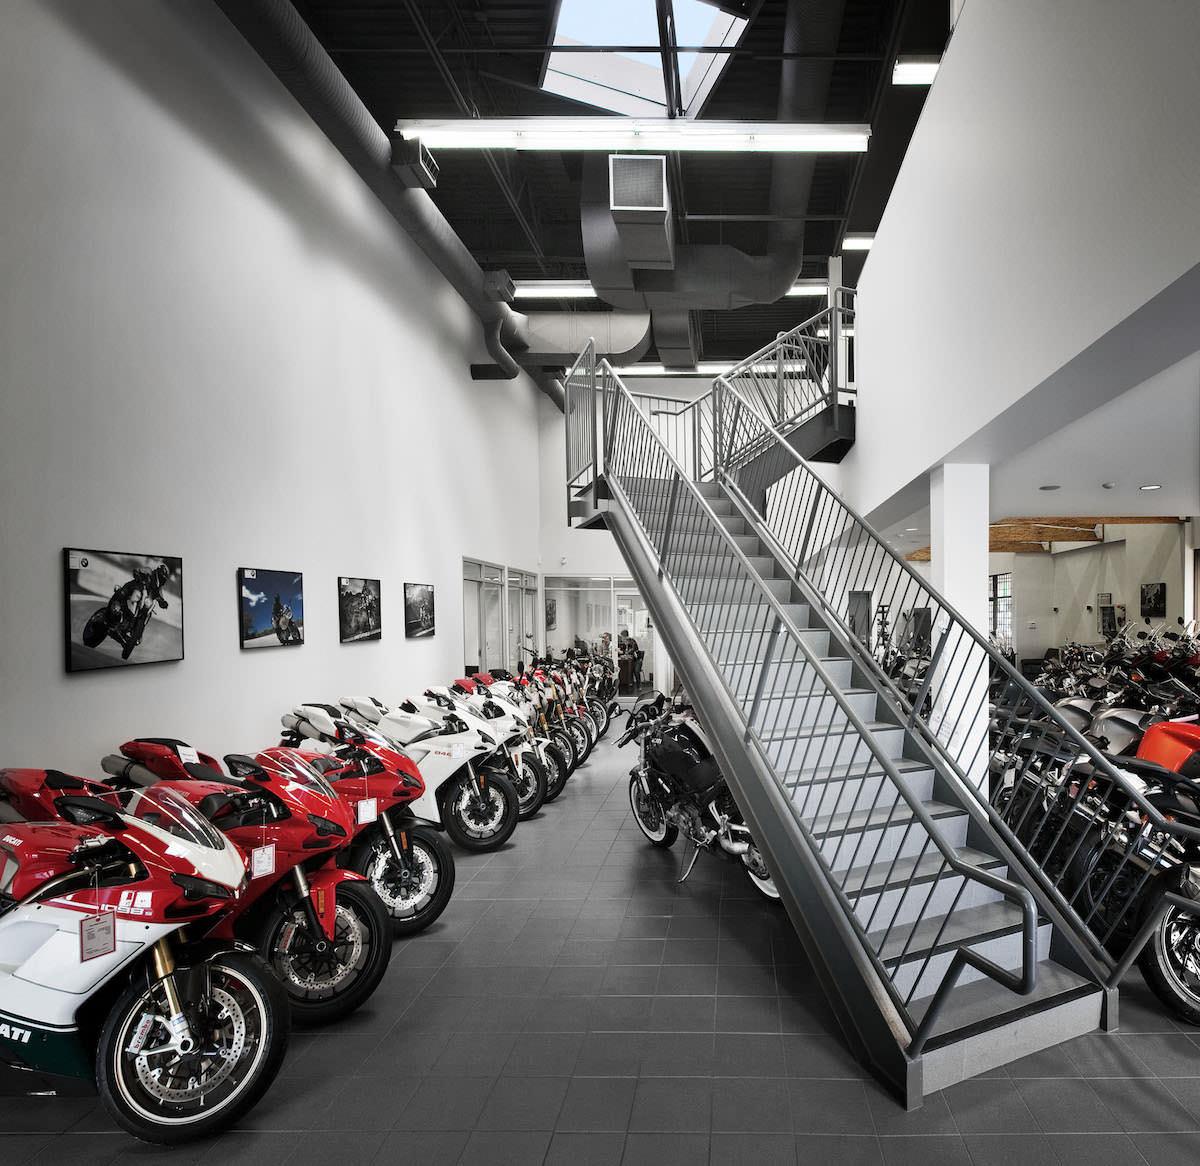 John Valk BMW / Ducati Dealership